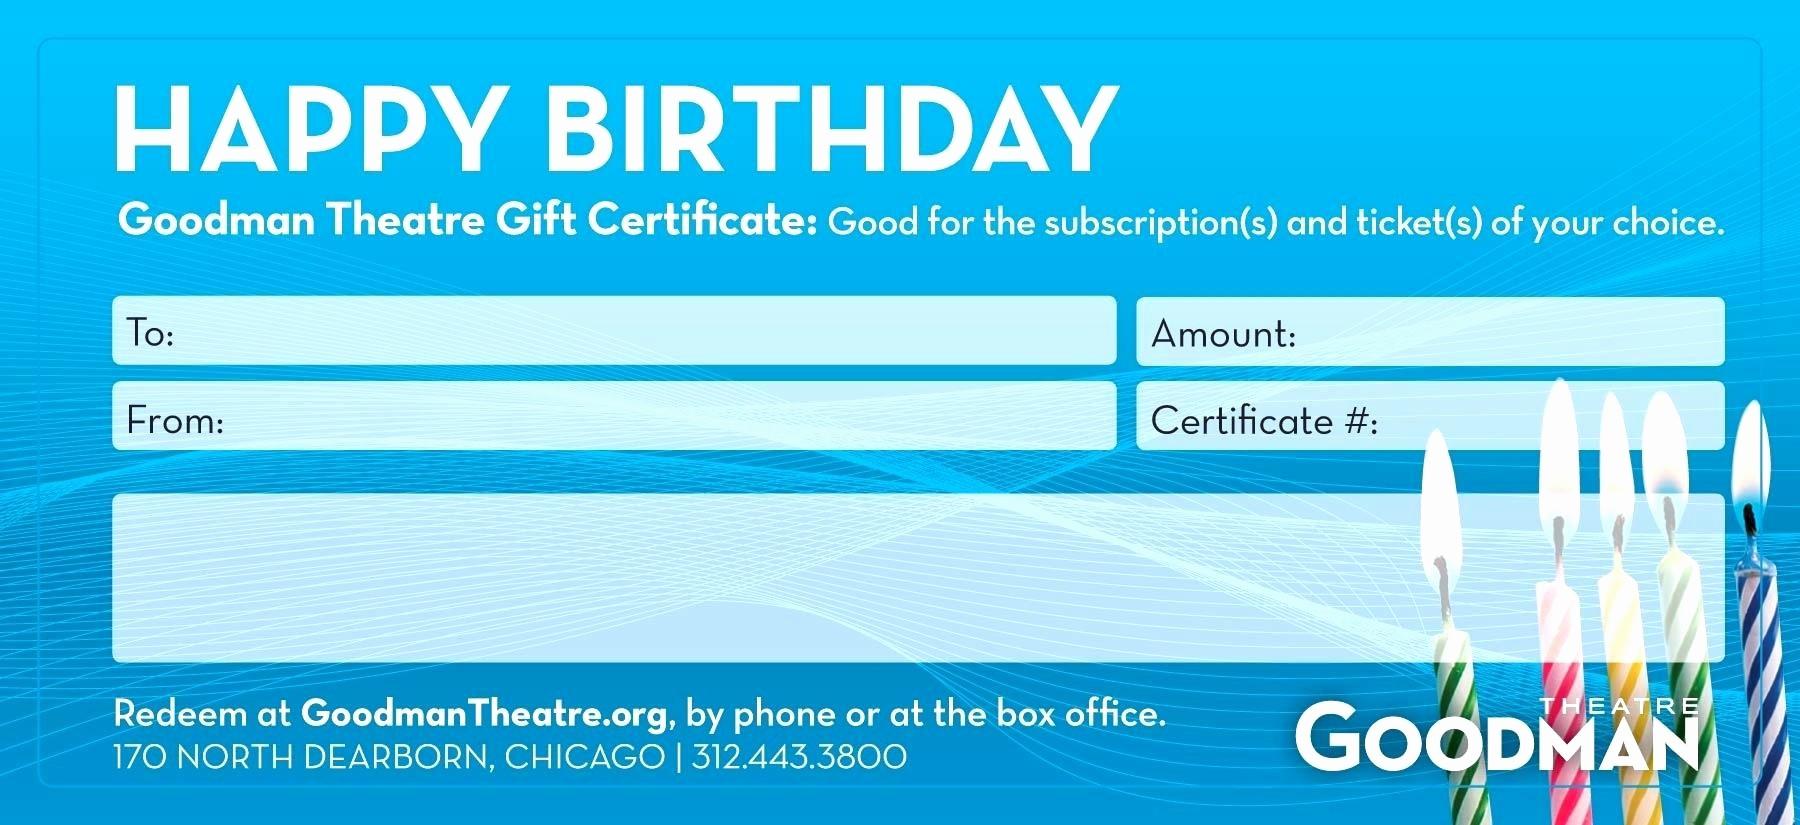 Birthday Gift Certificate Template Word Best Of Template Birthday Gift Certificate Template Word